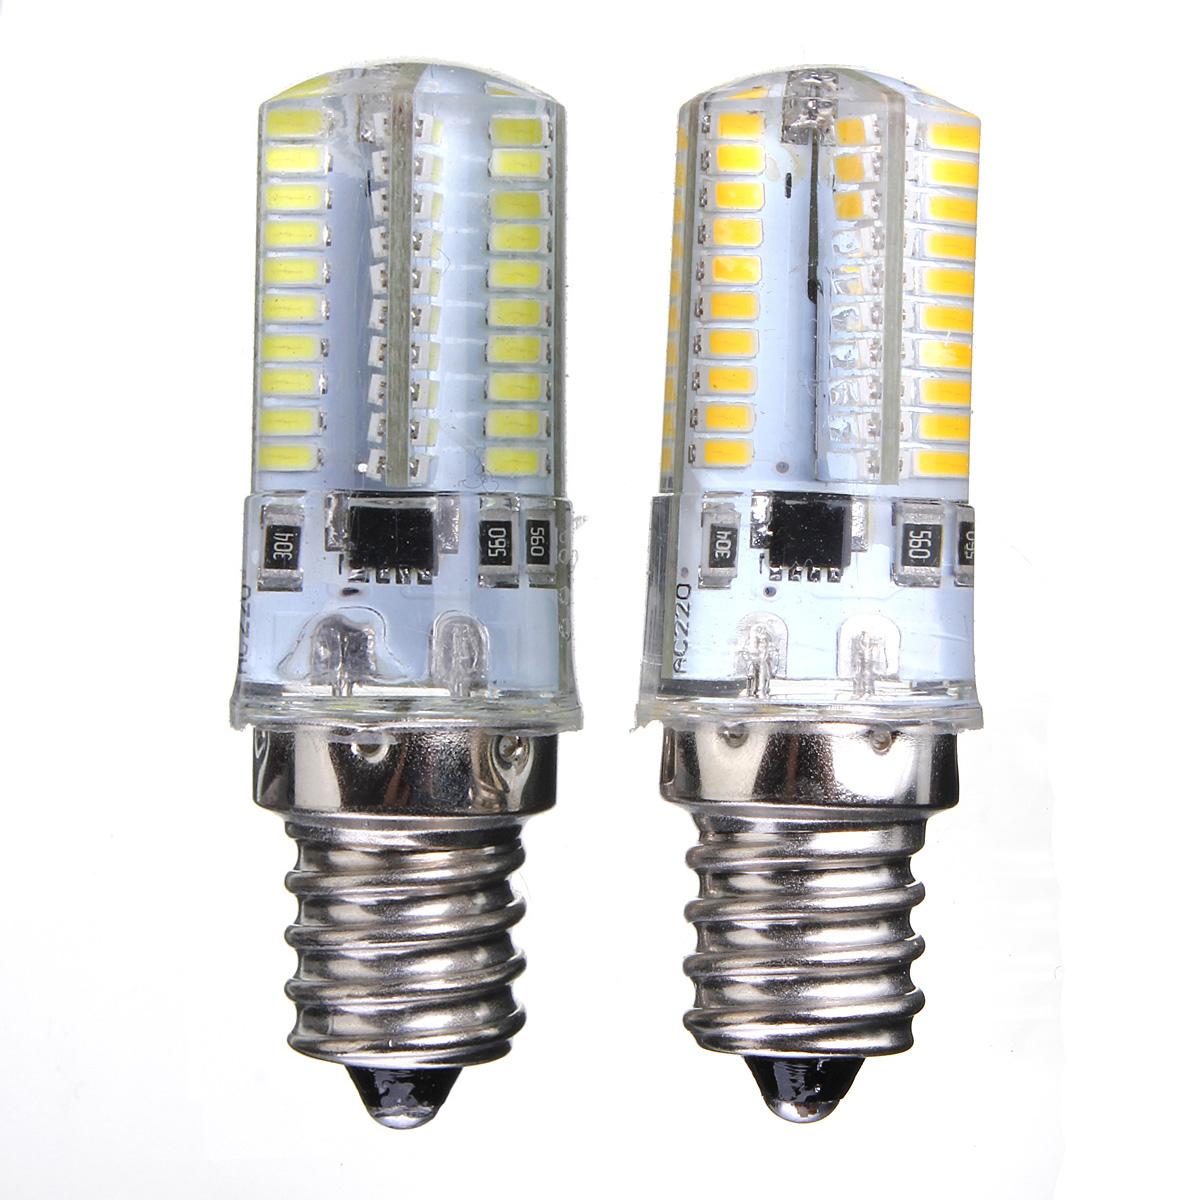 Ampoule G4 G9 E12 E14 E17 BA15D Dimmable 80 LED 3014 SMD Silicone Bulb Lampe NEW